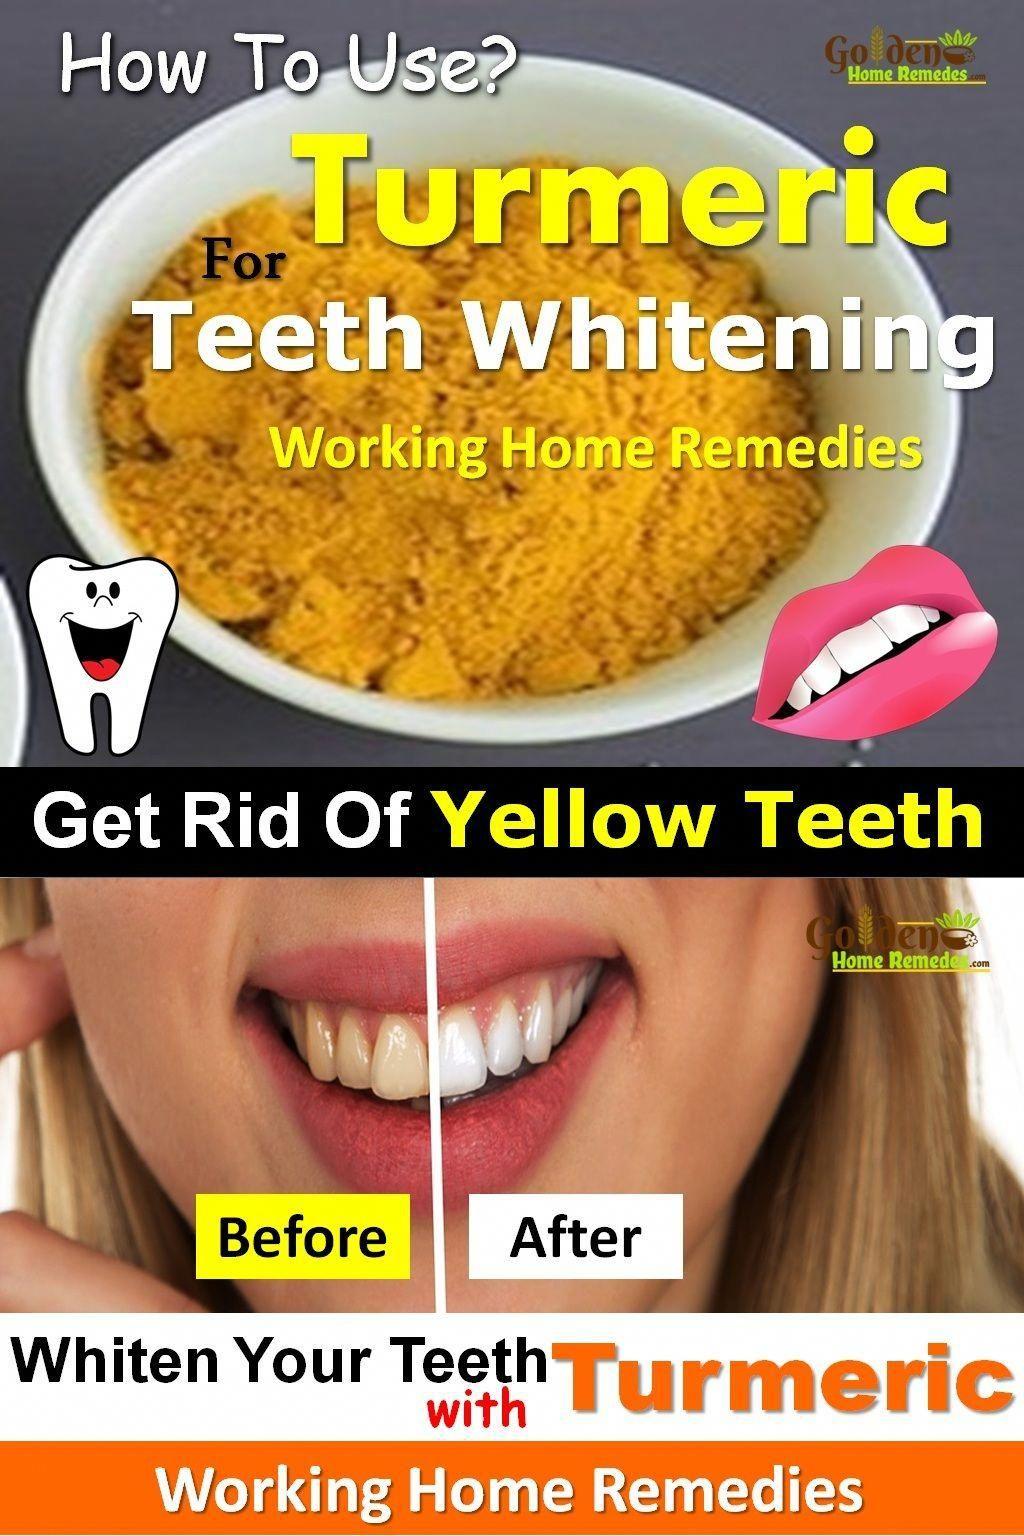 Teeth Whitening: Turmeric For Teeth Whitening: 10 Natural Ways To Use Turmeric For Teeth